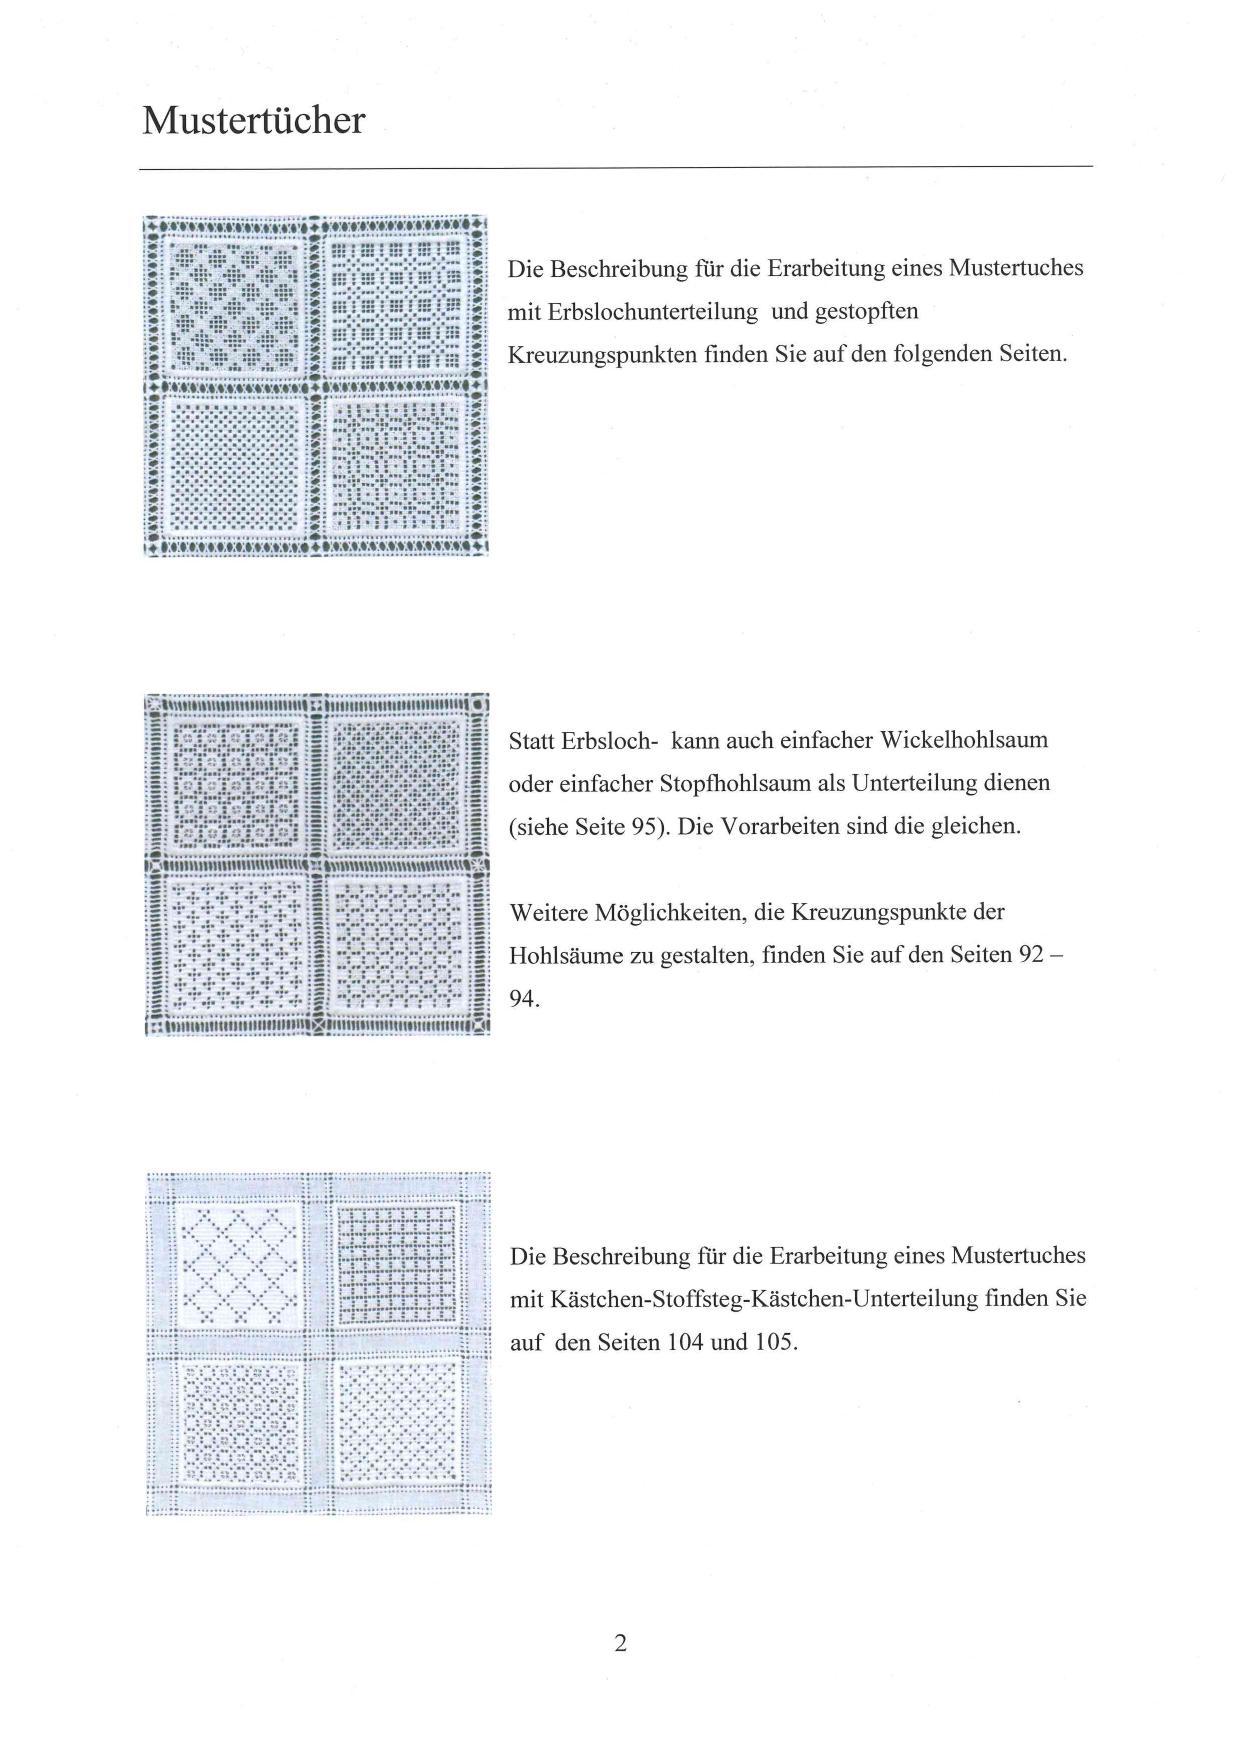 "Mustertücher ""Lichte Muster"" 5 / 8"